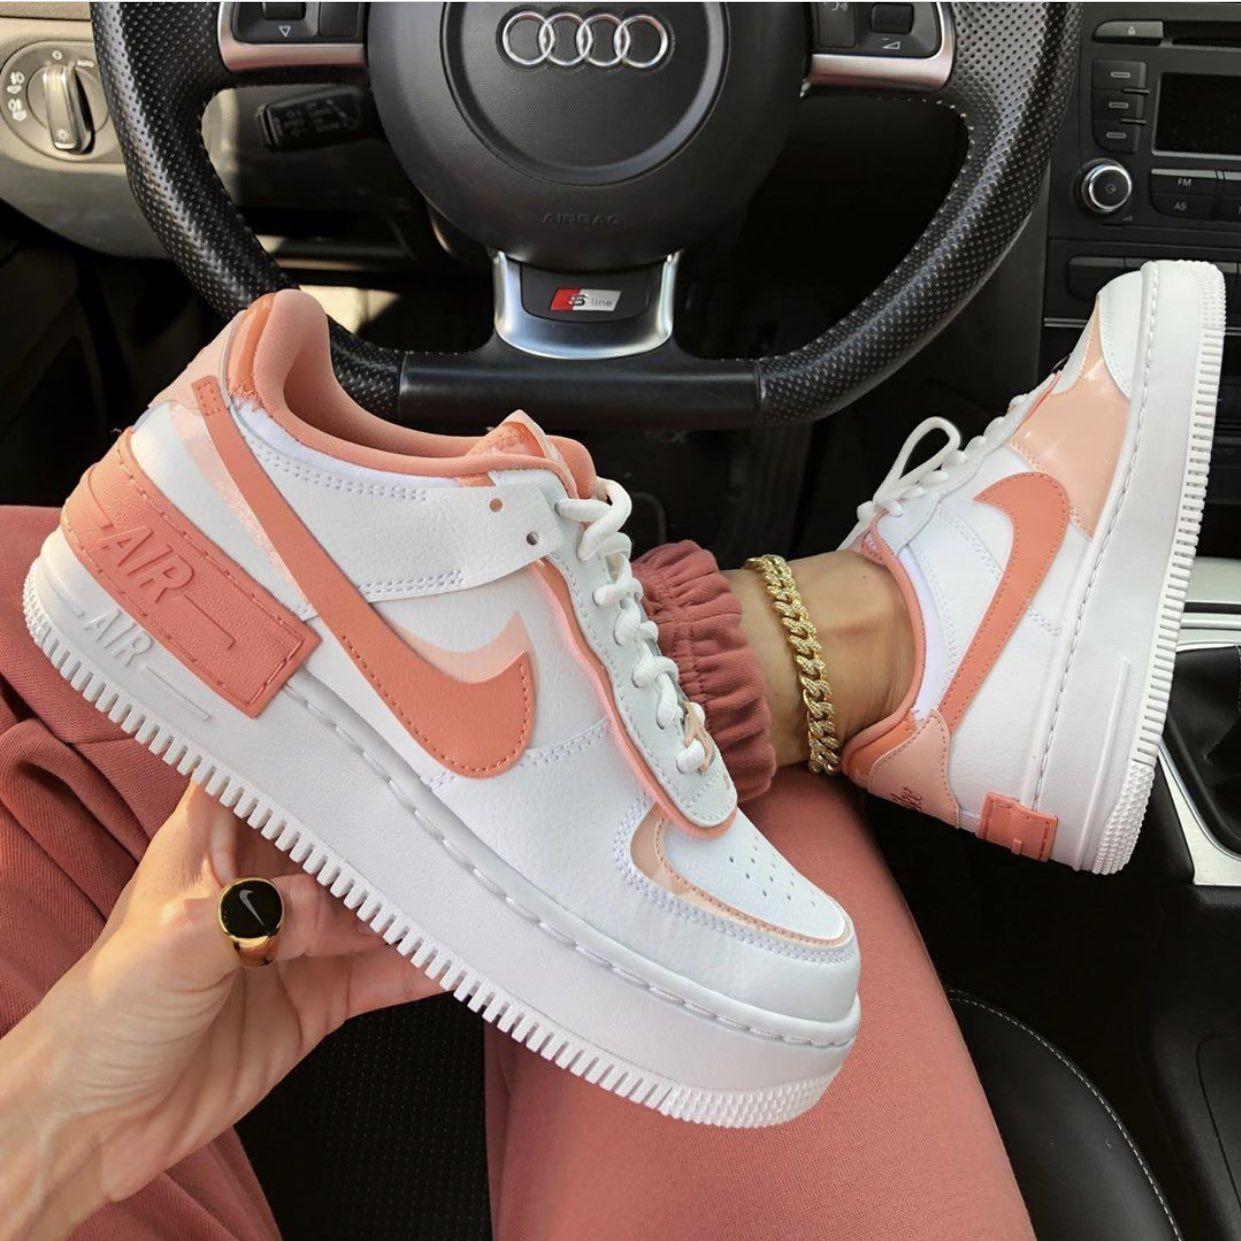 Aventurero Por nombre Cirugía  👜 on Twitter | Nike air shoes, White nike shoes, Outfit shoes